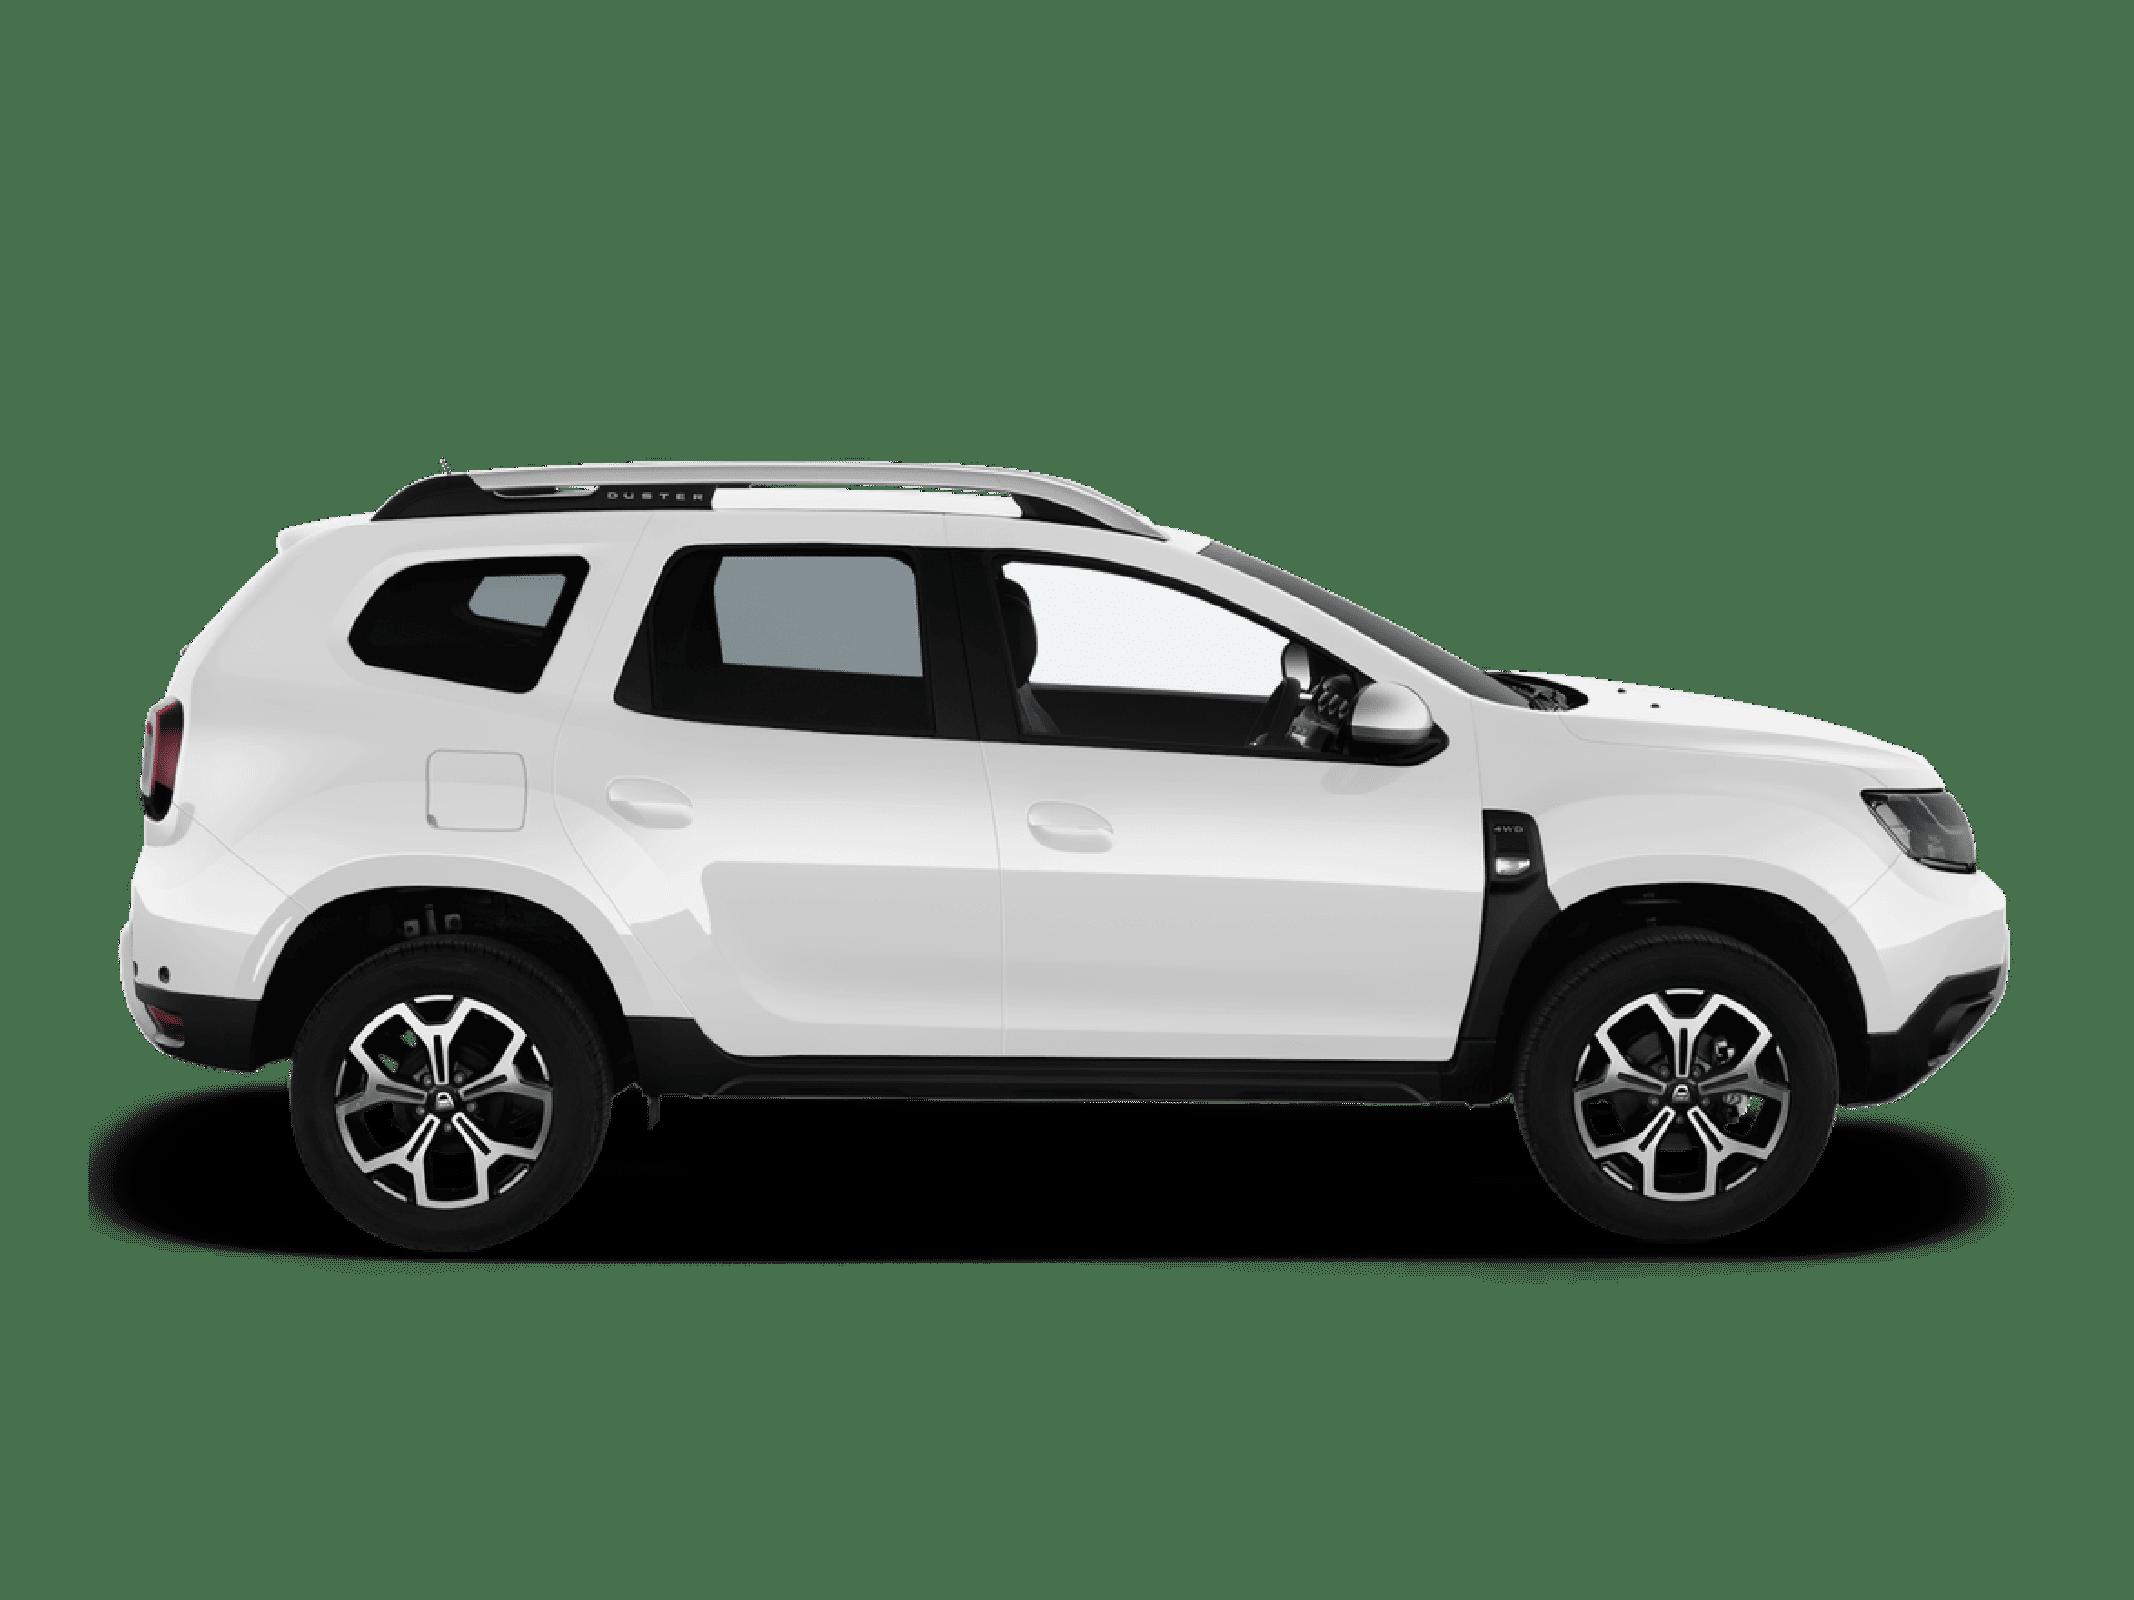 Dacia Duster rental car in Iceland